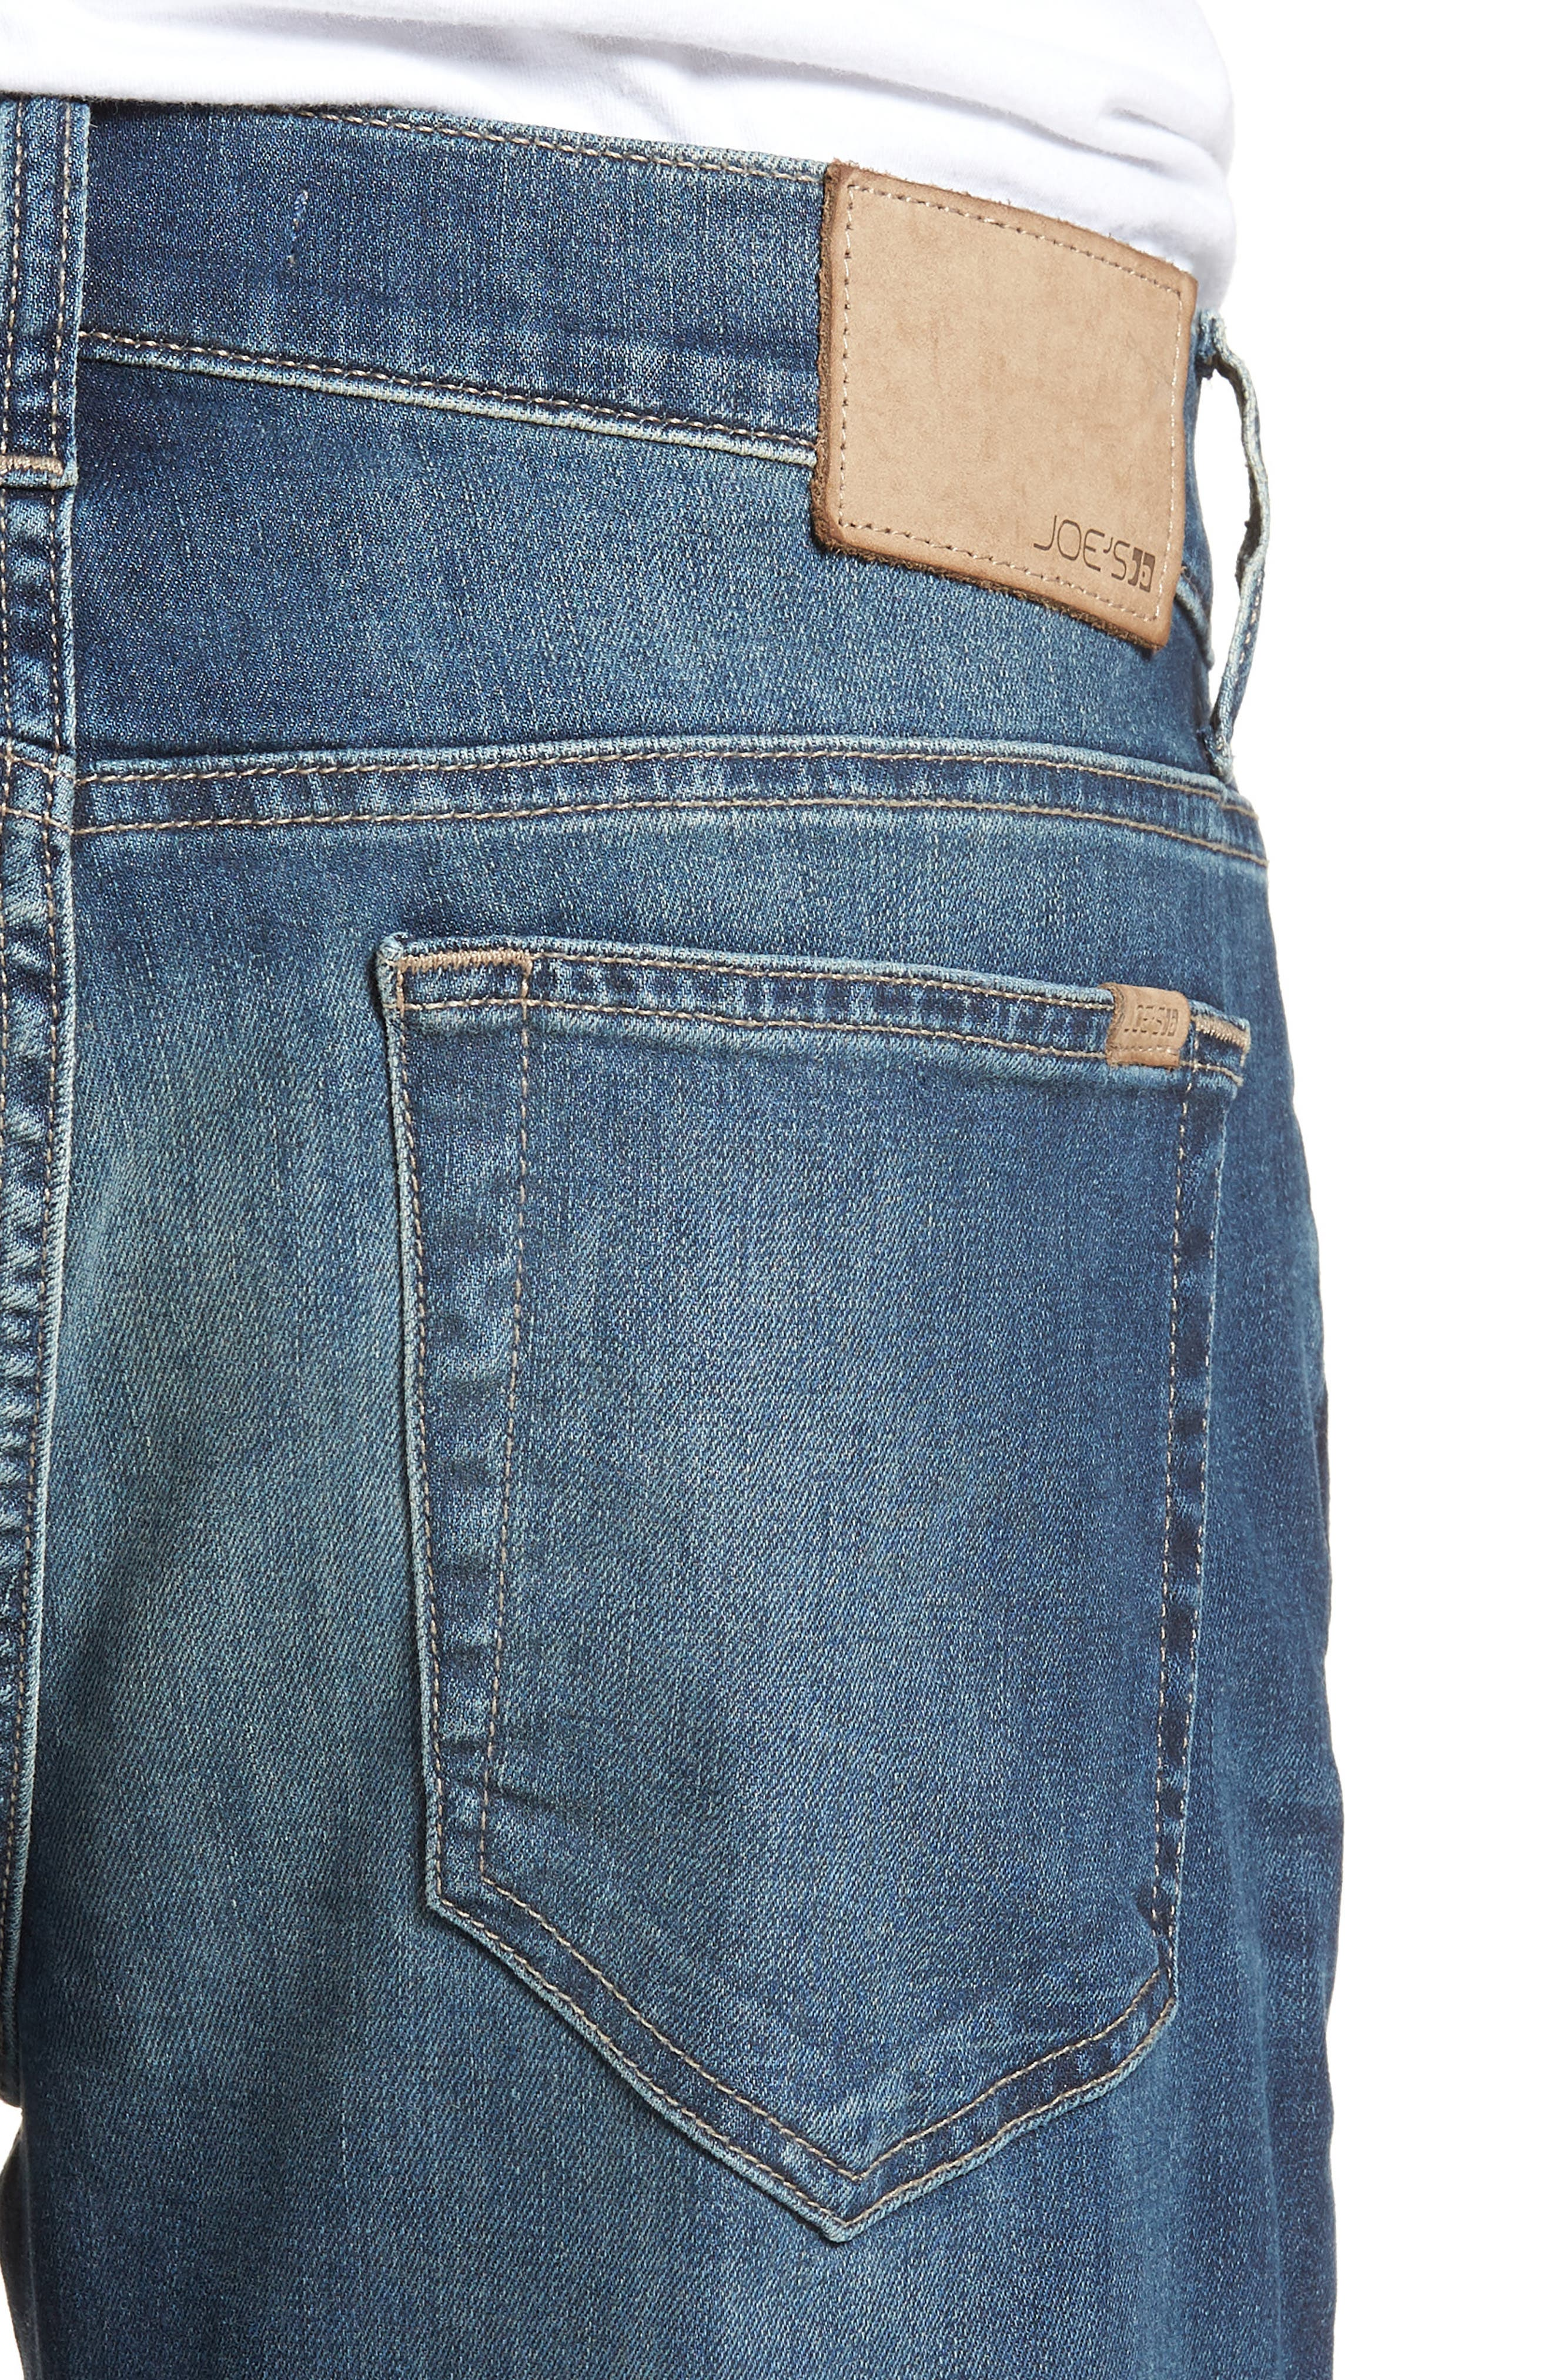 Brixton Slim Straight Fit Jeans,                             Alternate thumbnail 4, color,                             400